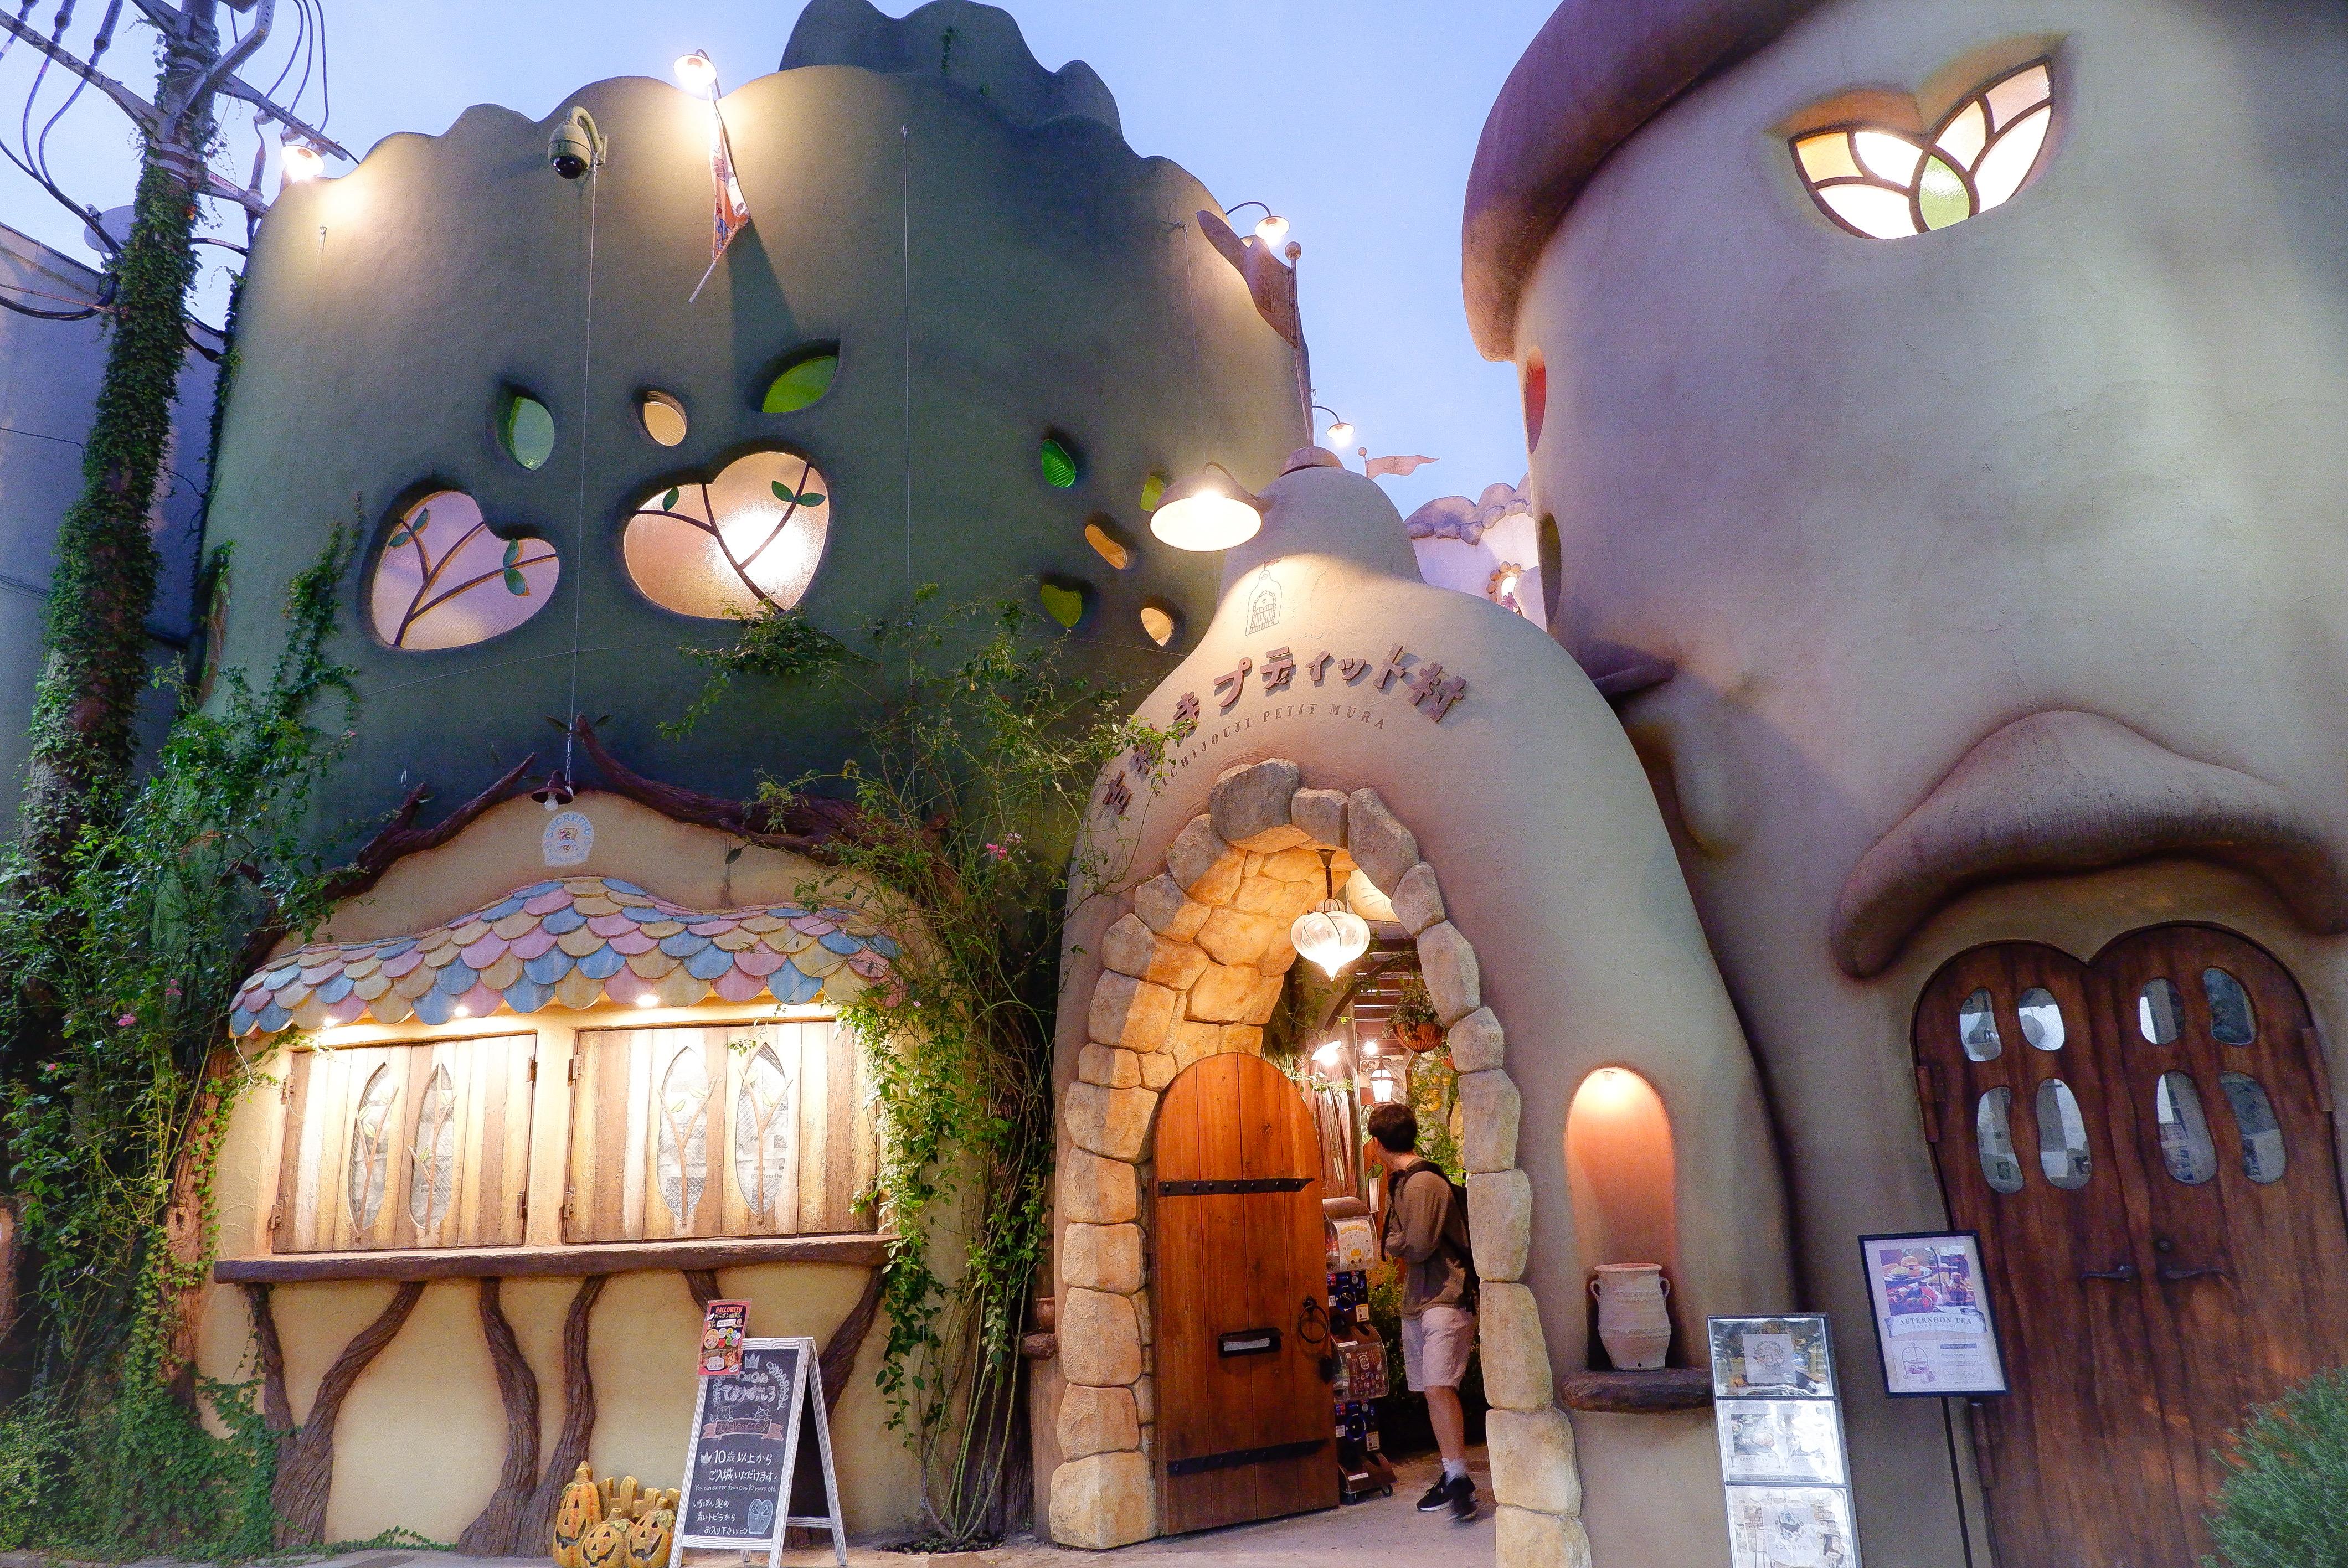 The Most Ghibli Esque Cat Cafe In Tokyo Temari No Oshiro Zeenfinity